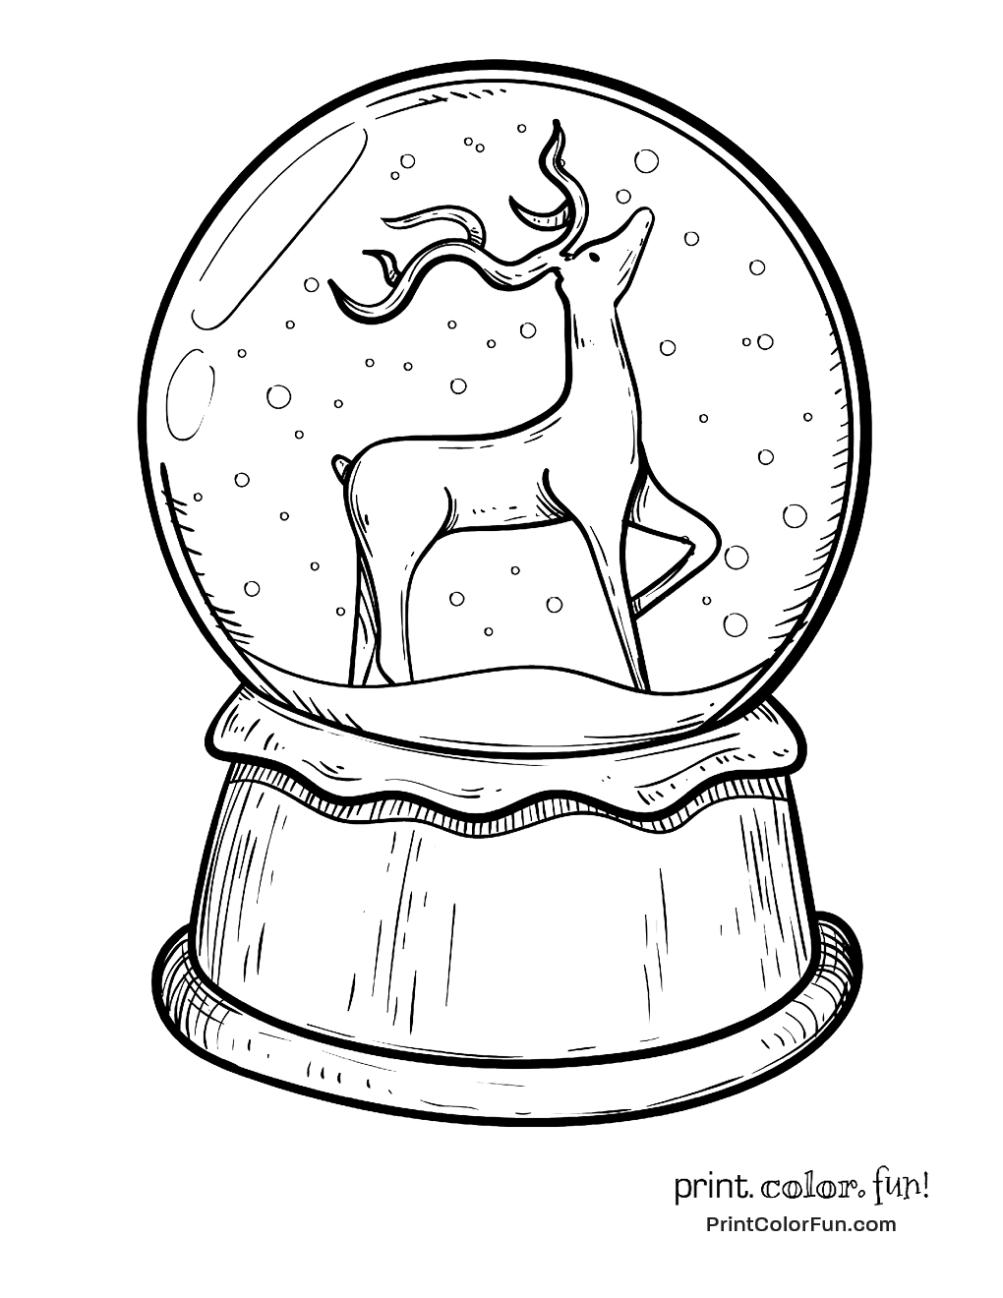 1003x1298 Christmas Snow Globe With Reindeer Buenas Ideas